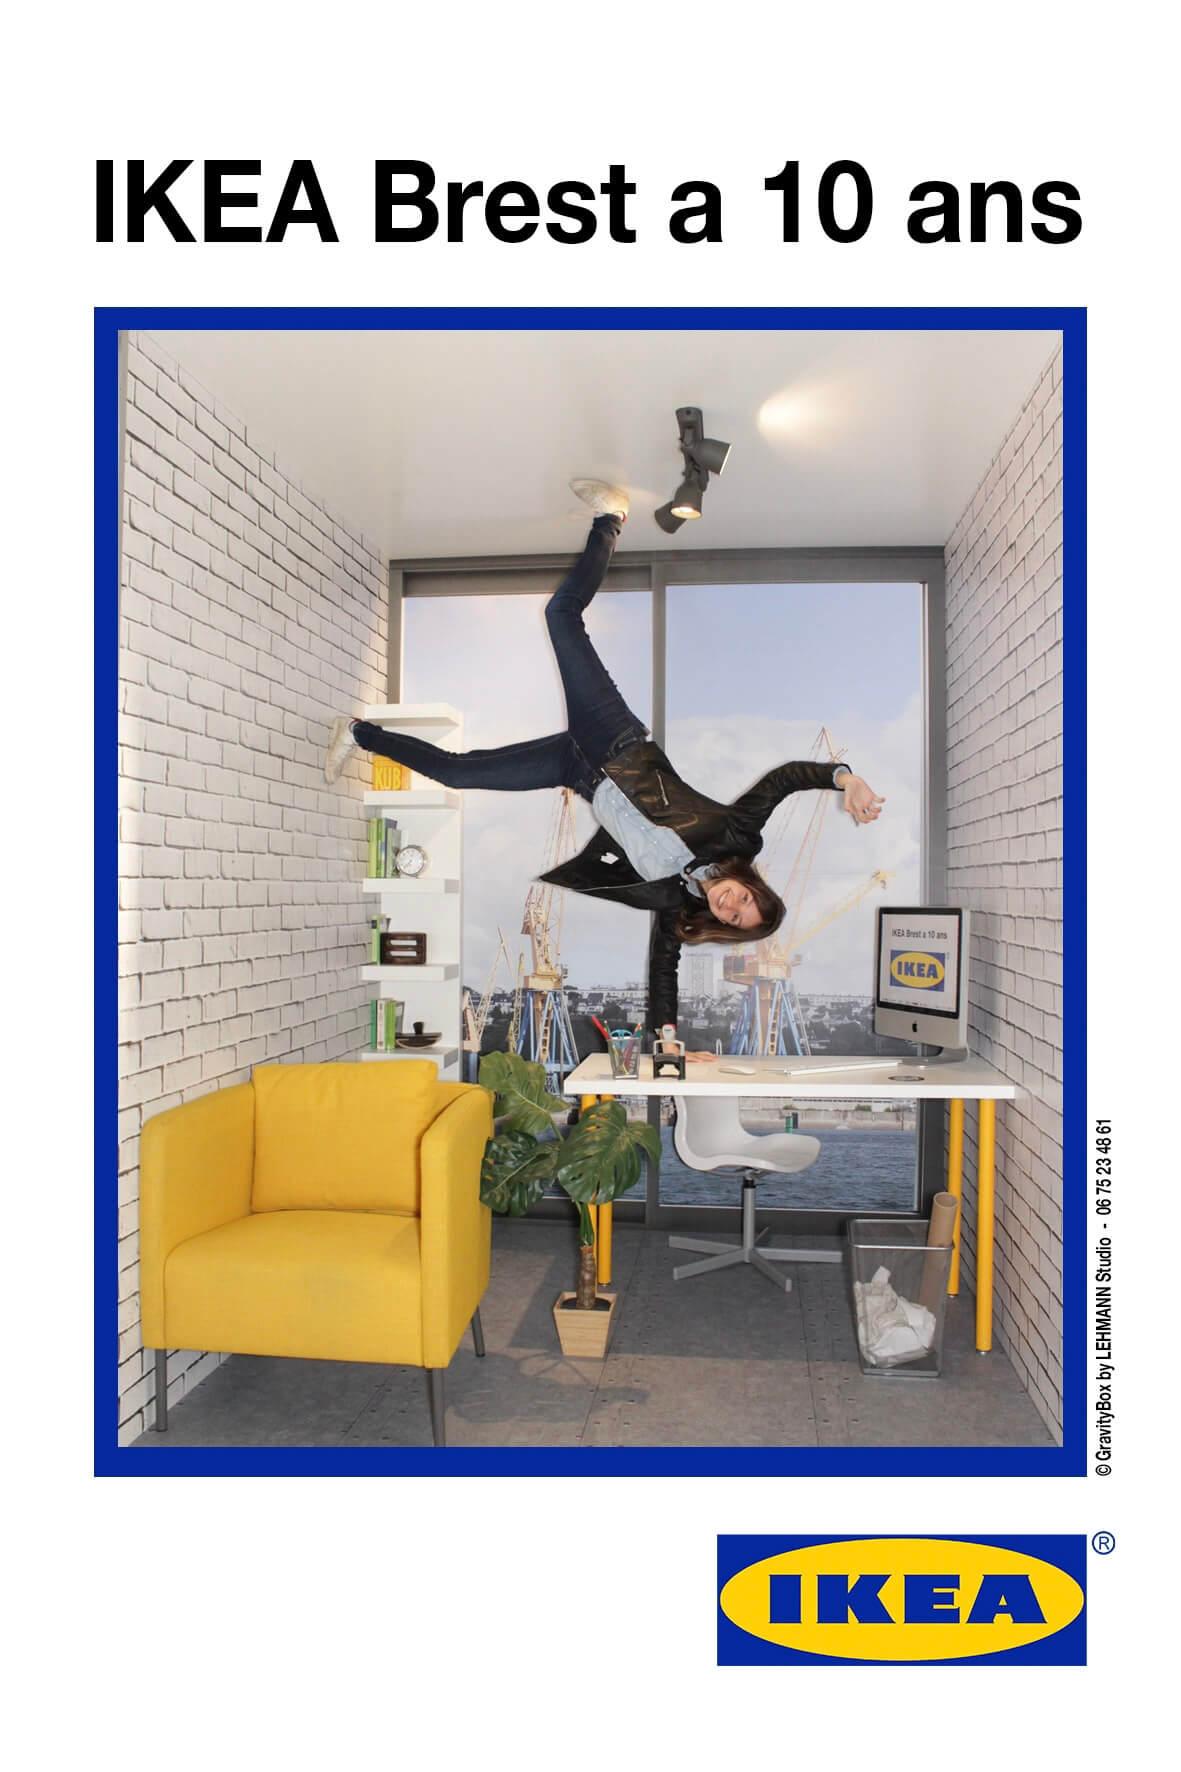 lehman-studio-photographe-angers-evenementiel-gravitybox-ambiance-bureau-ikea